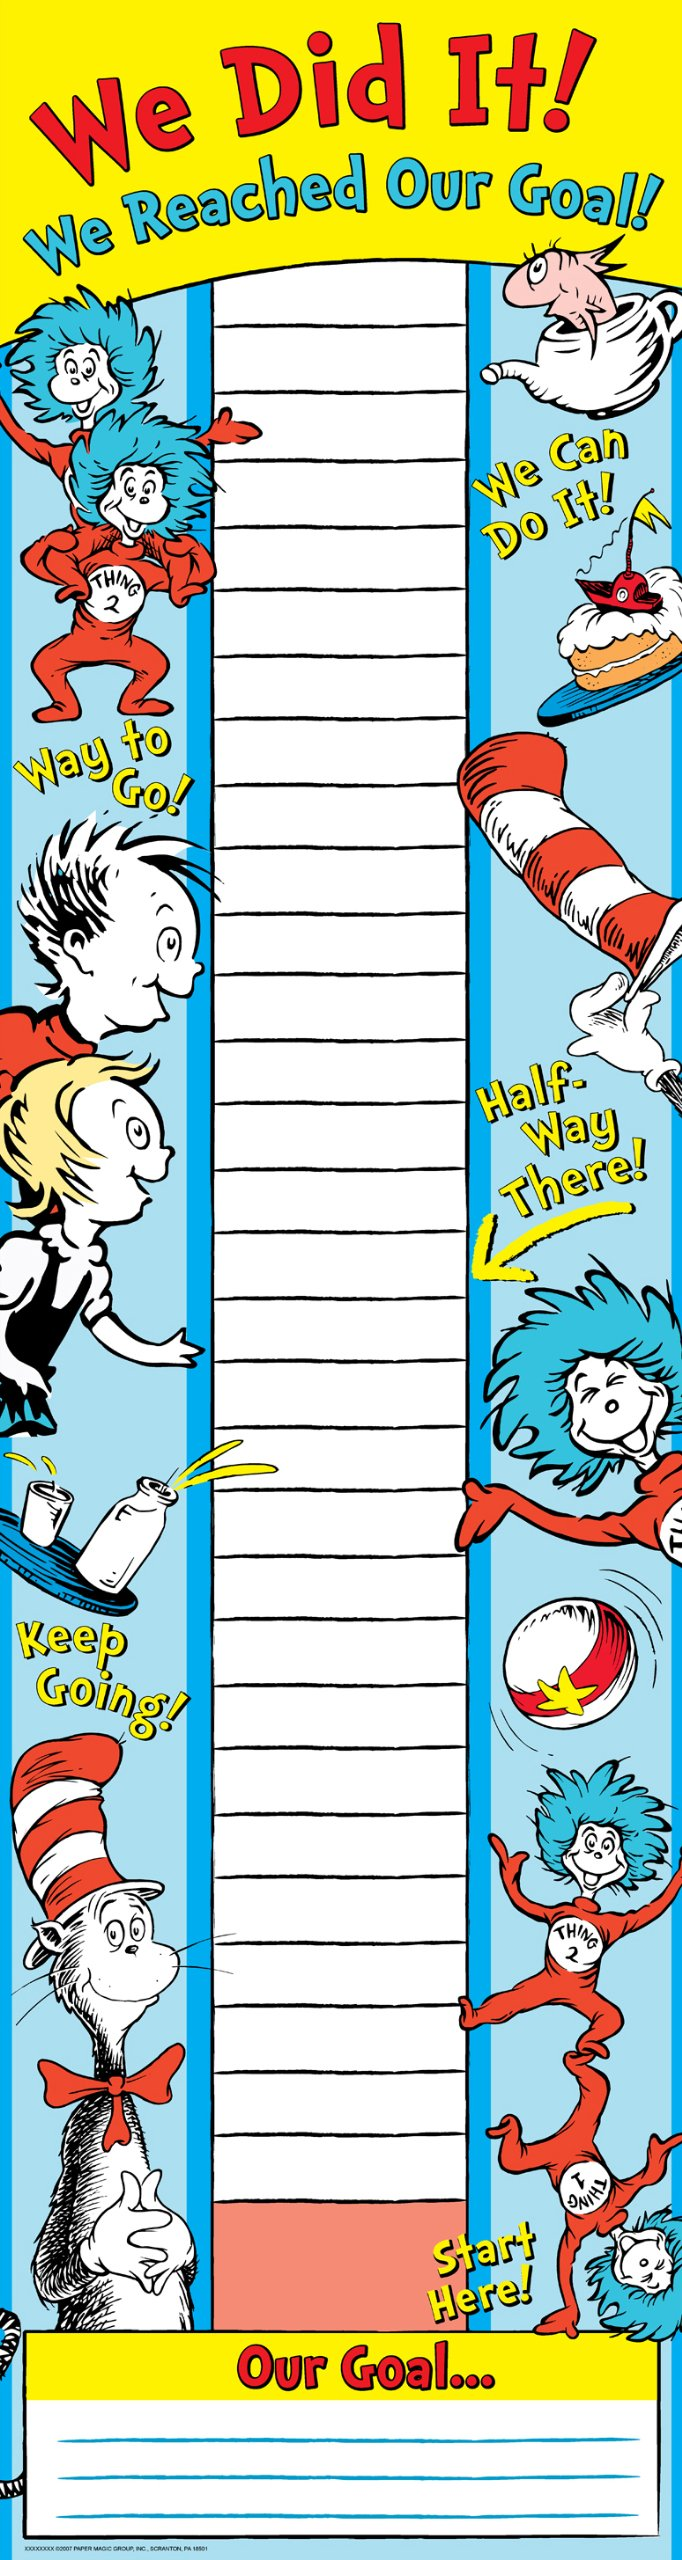 Eureka School 849583 Eureka Dr. Seuss Vertical Classroom Banner, Goal Setting, Measures 45 x 12''